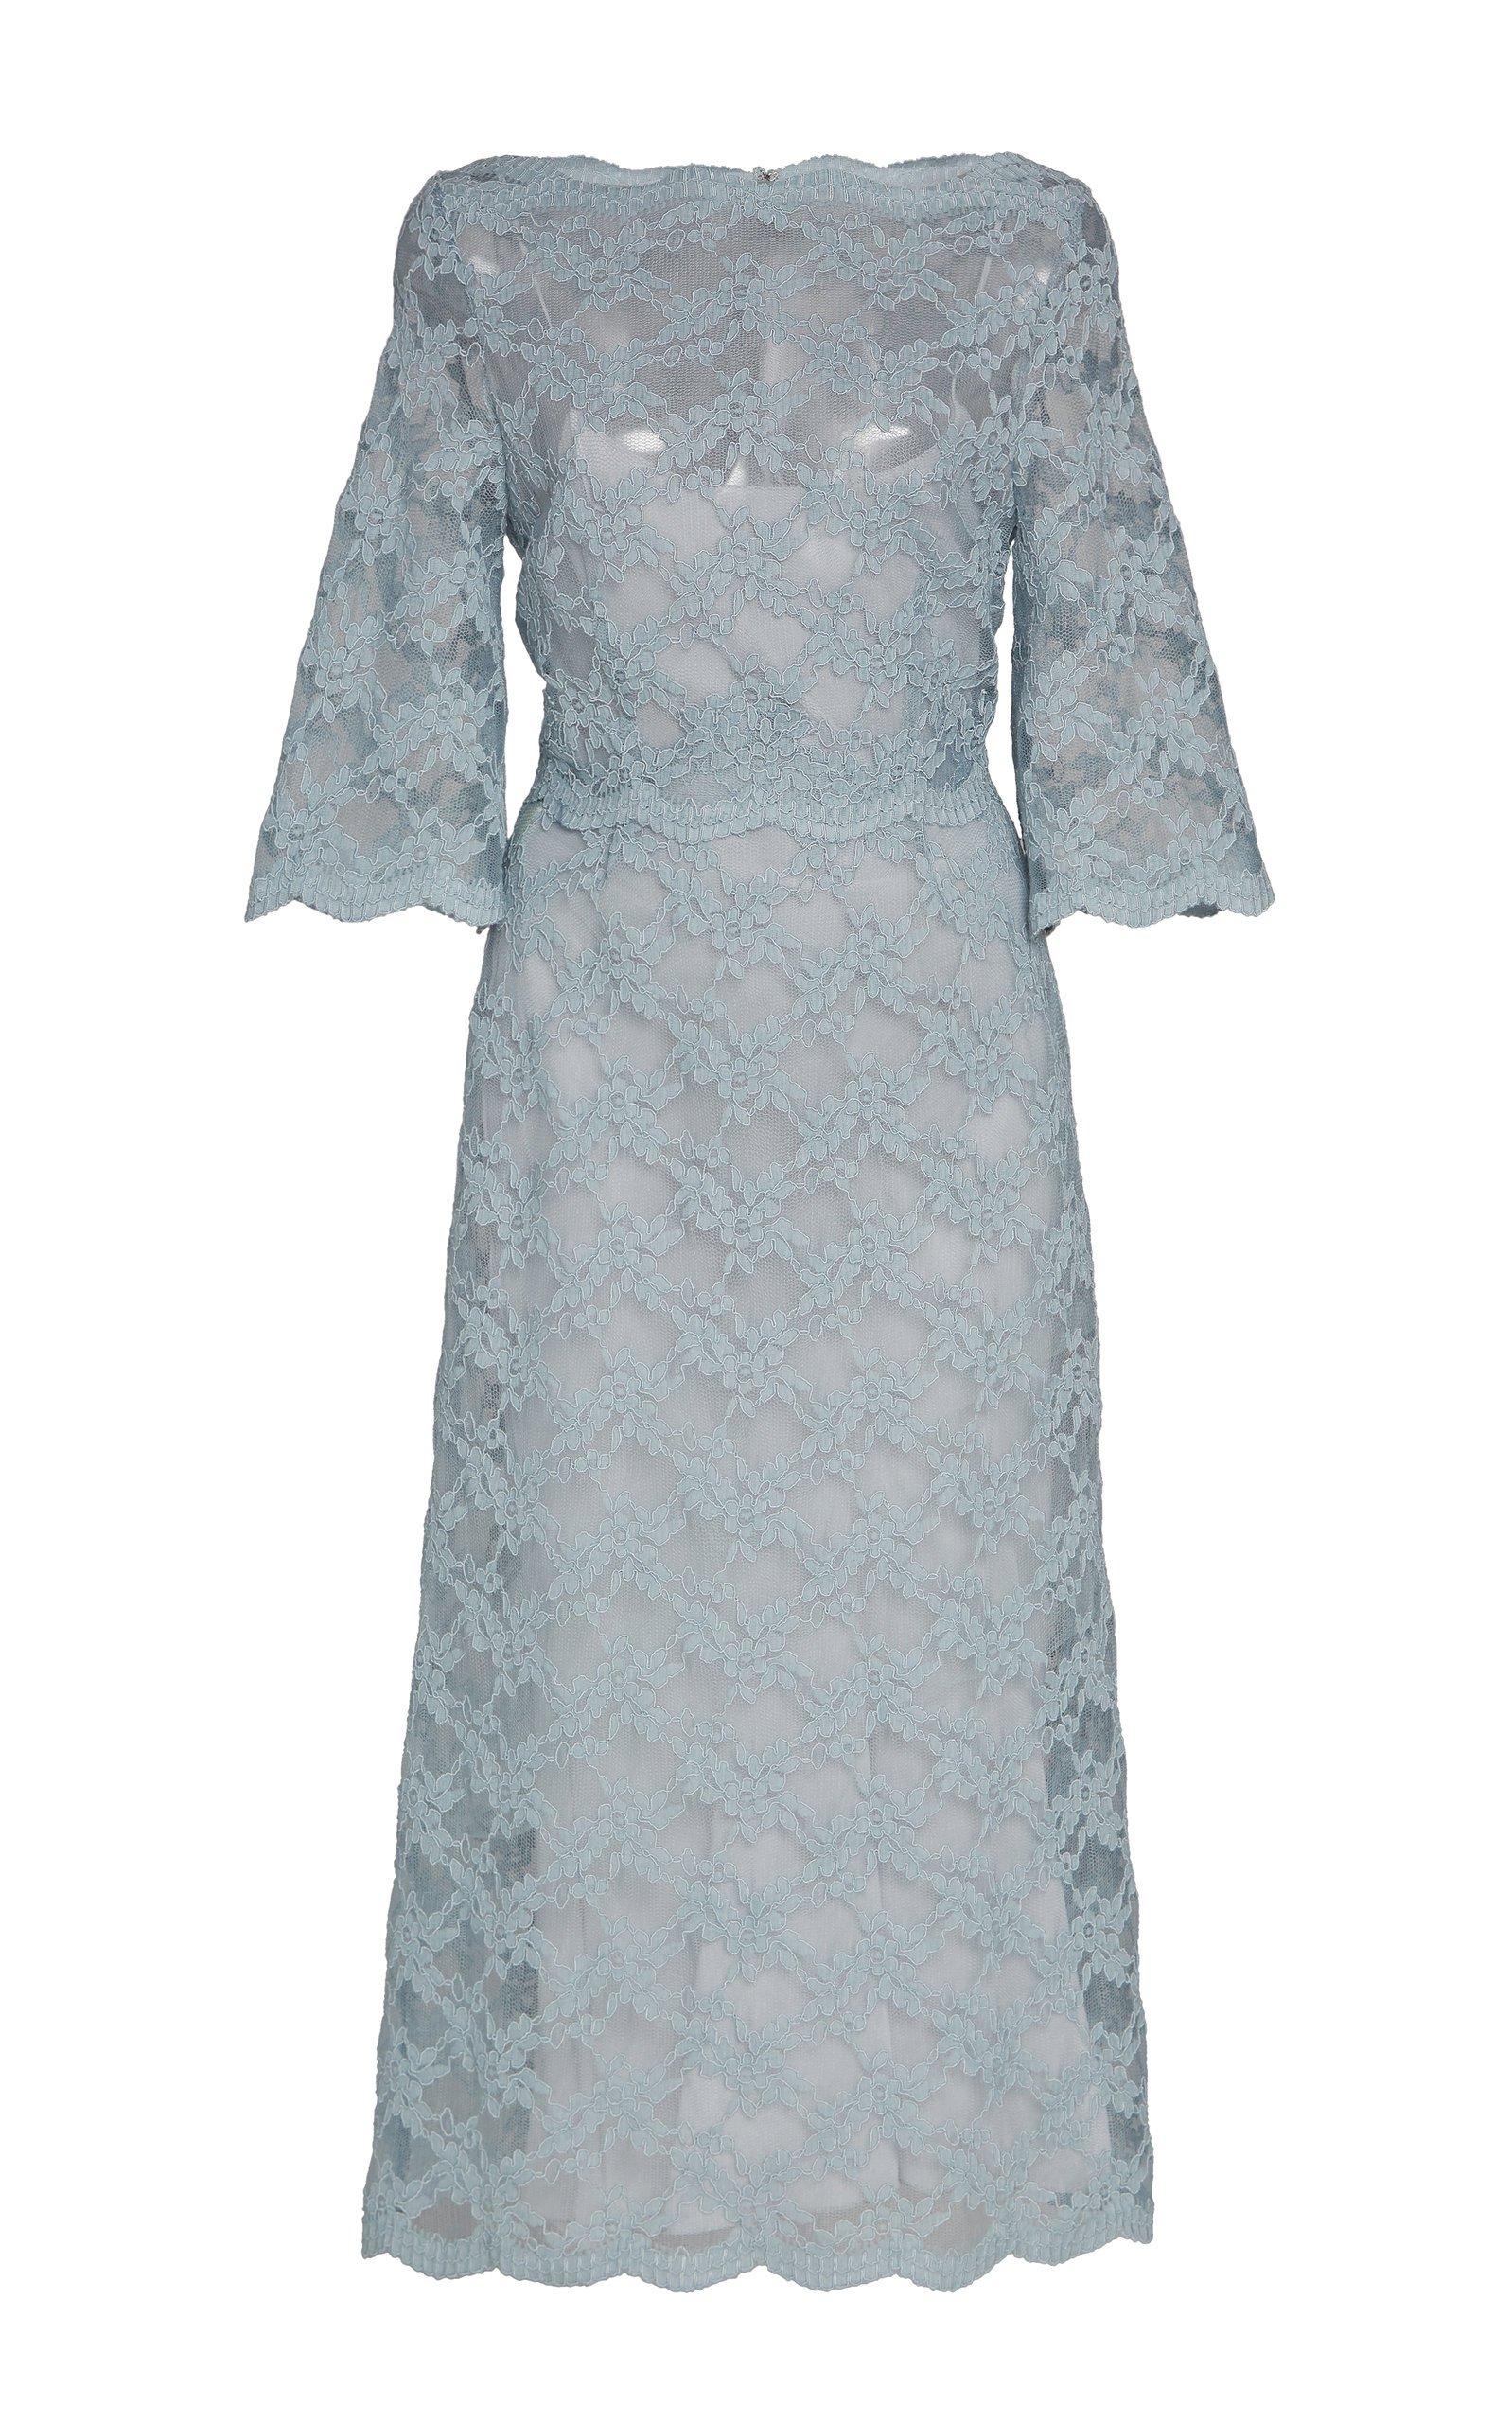 Luisa Beccaria Lace Midi Dress